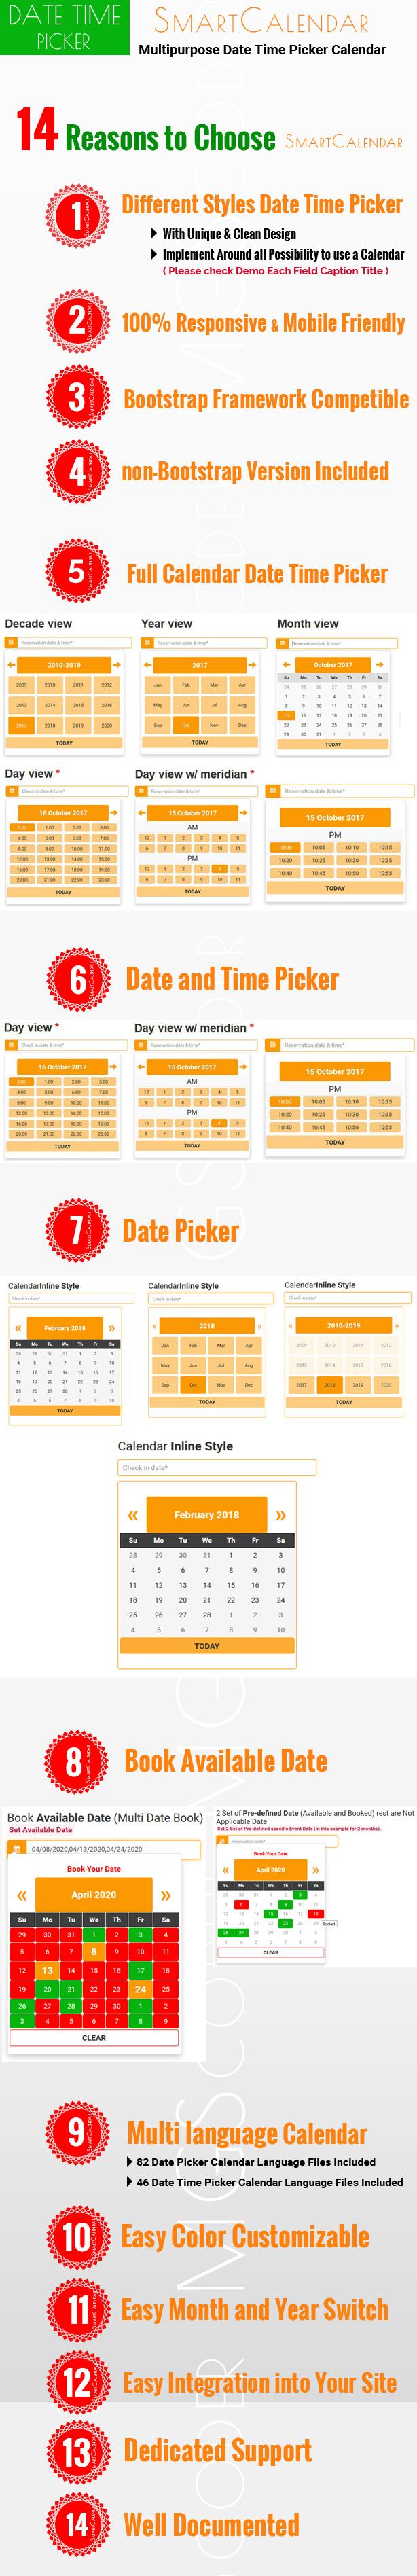 smartcalendar-features